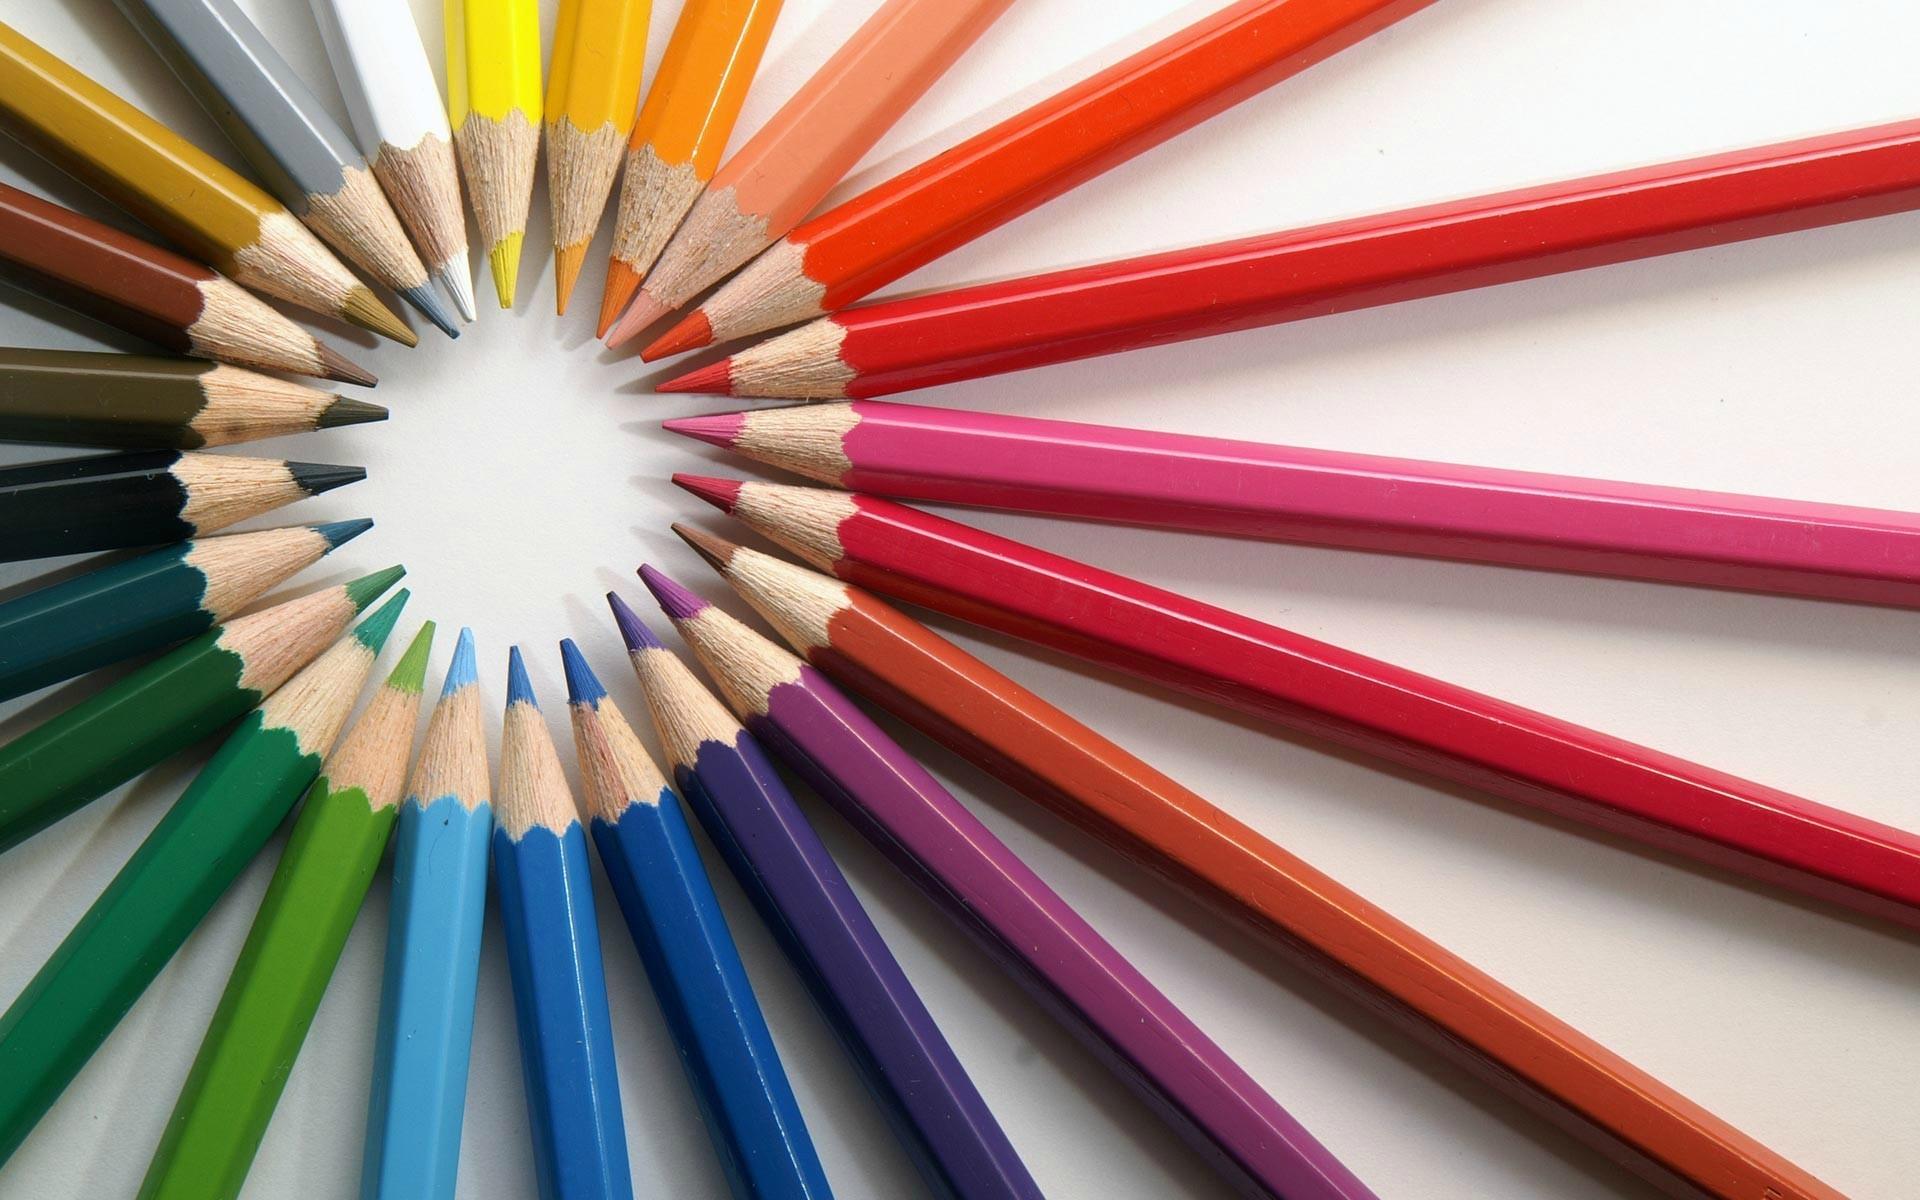 Rainbow Colored Pencils Wallpaper